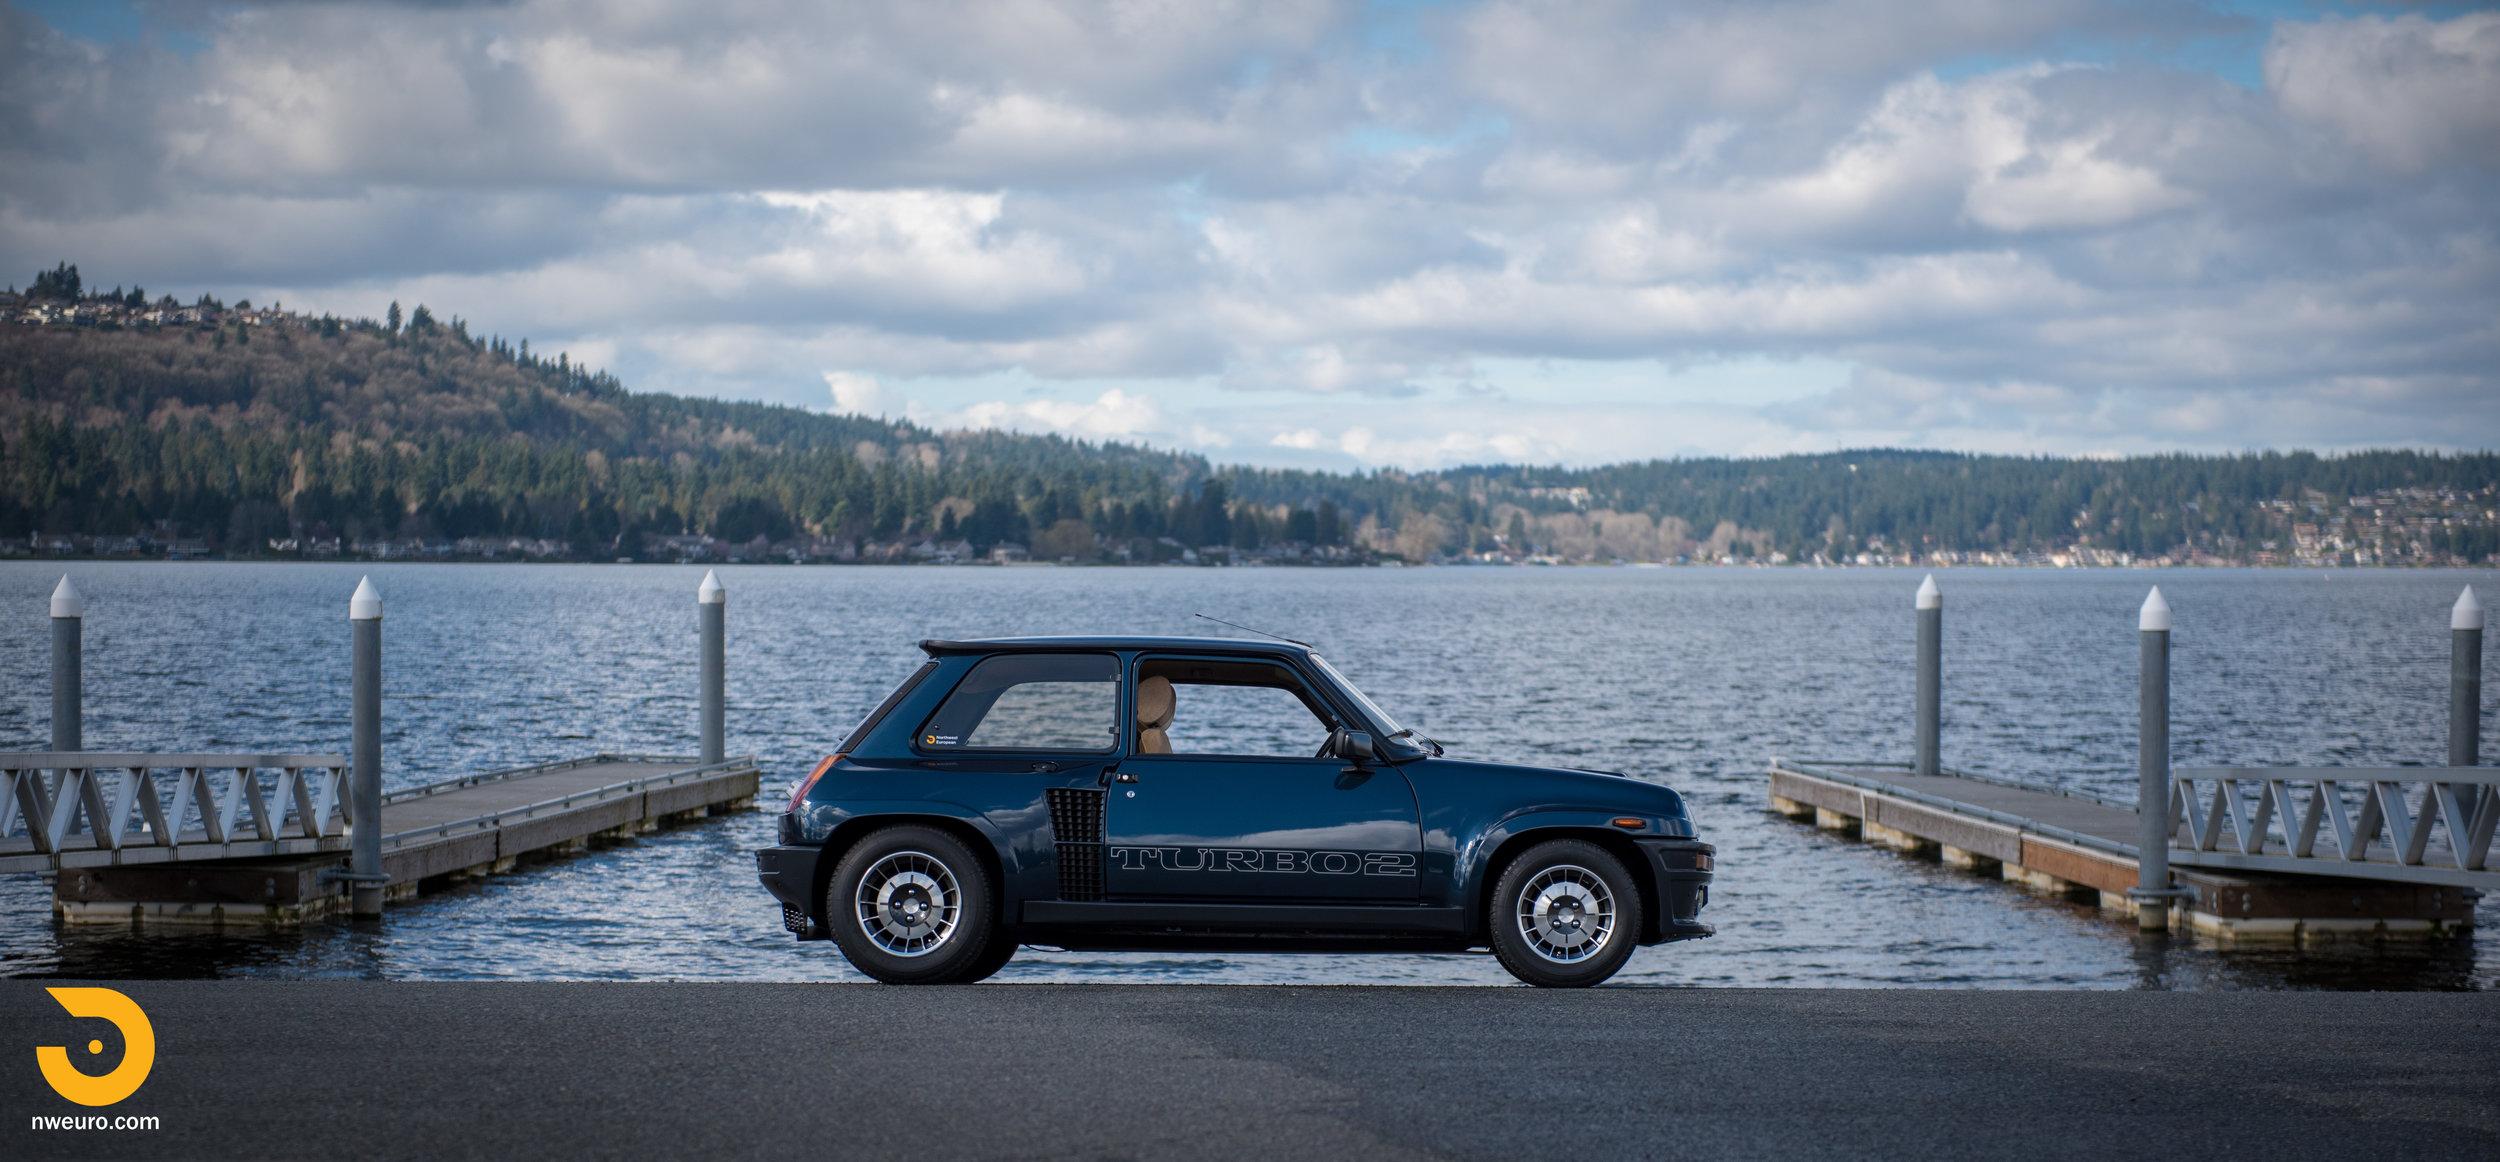 1983 Renault R5 Turbo 2-14.jpg